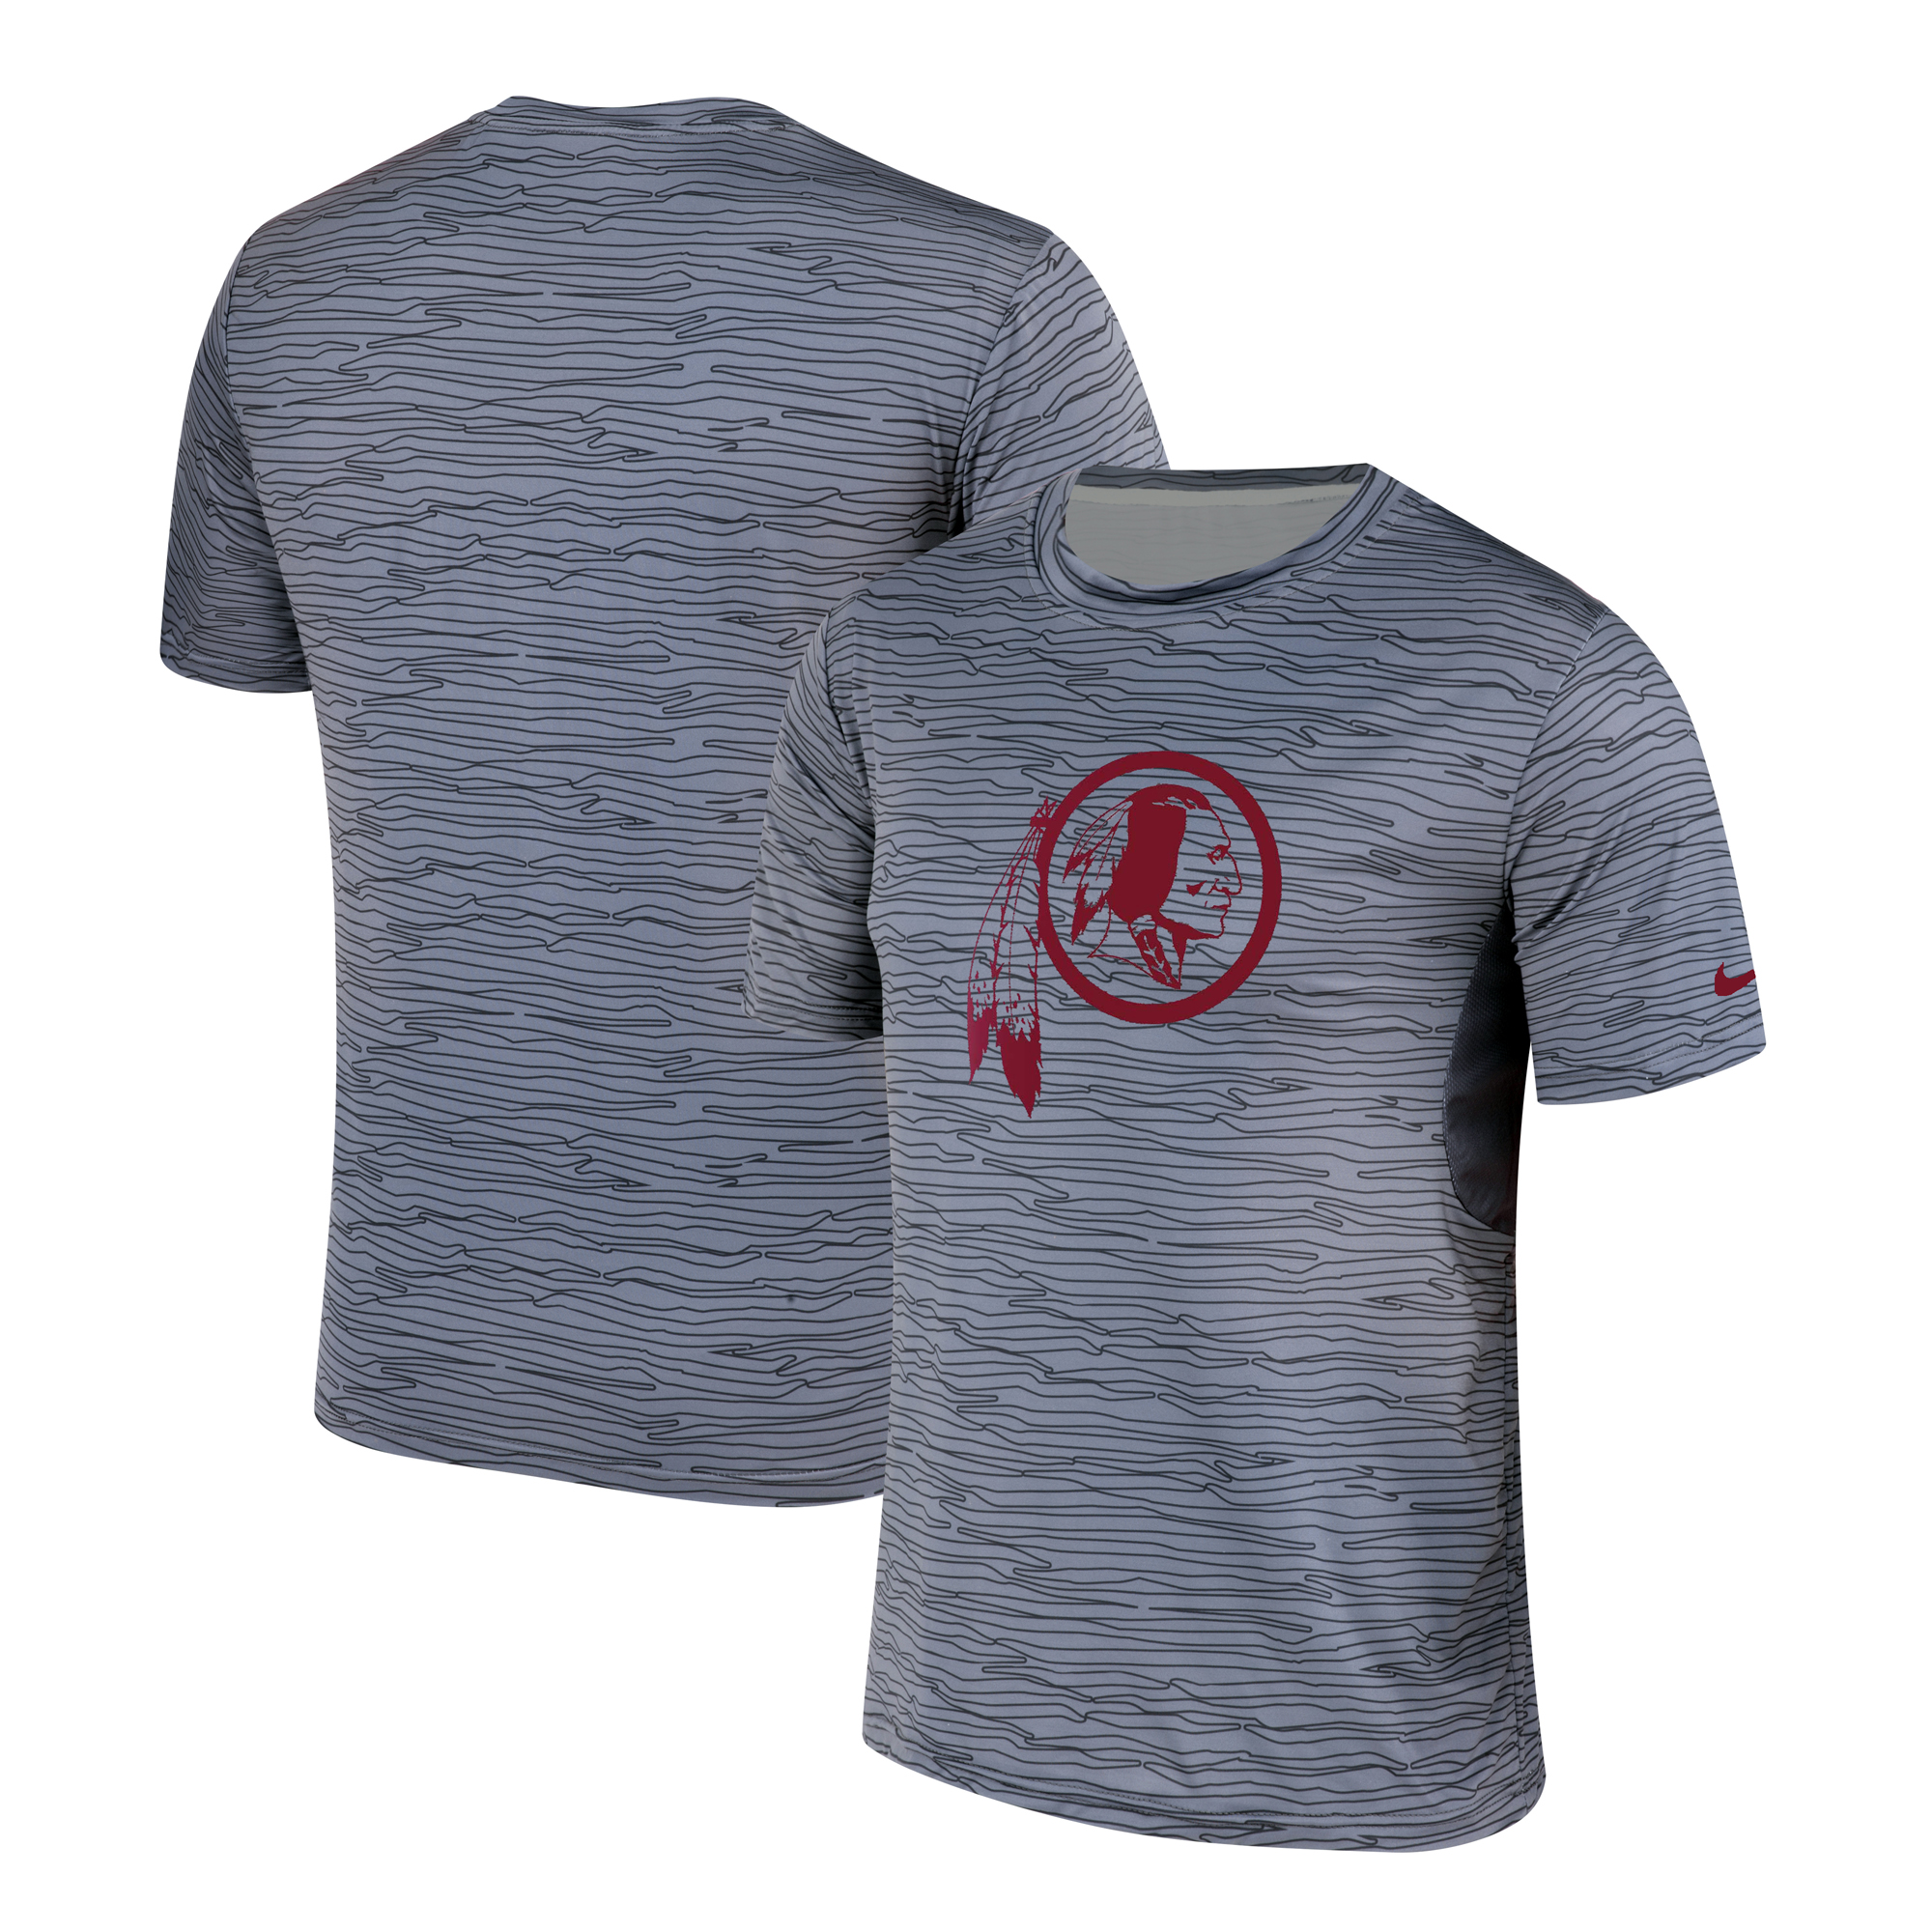 Men's Washington Redskins Nike Gray Black Striped Logo Performance T-Shirt